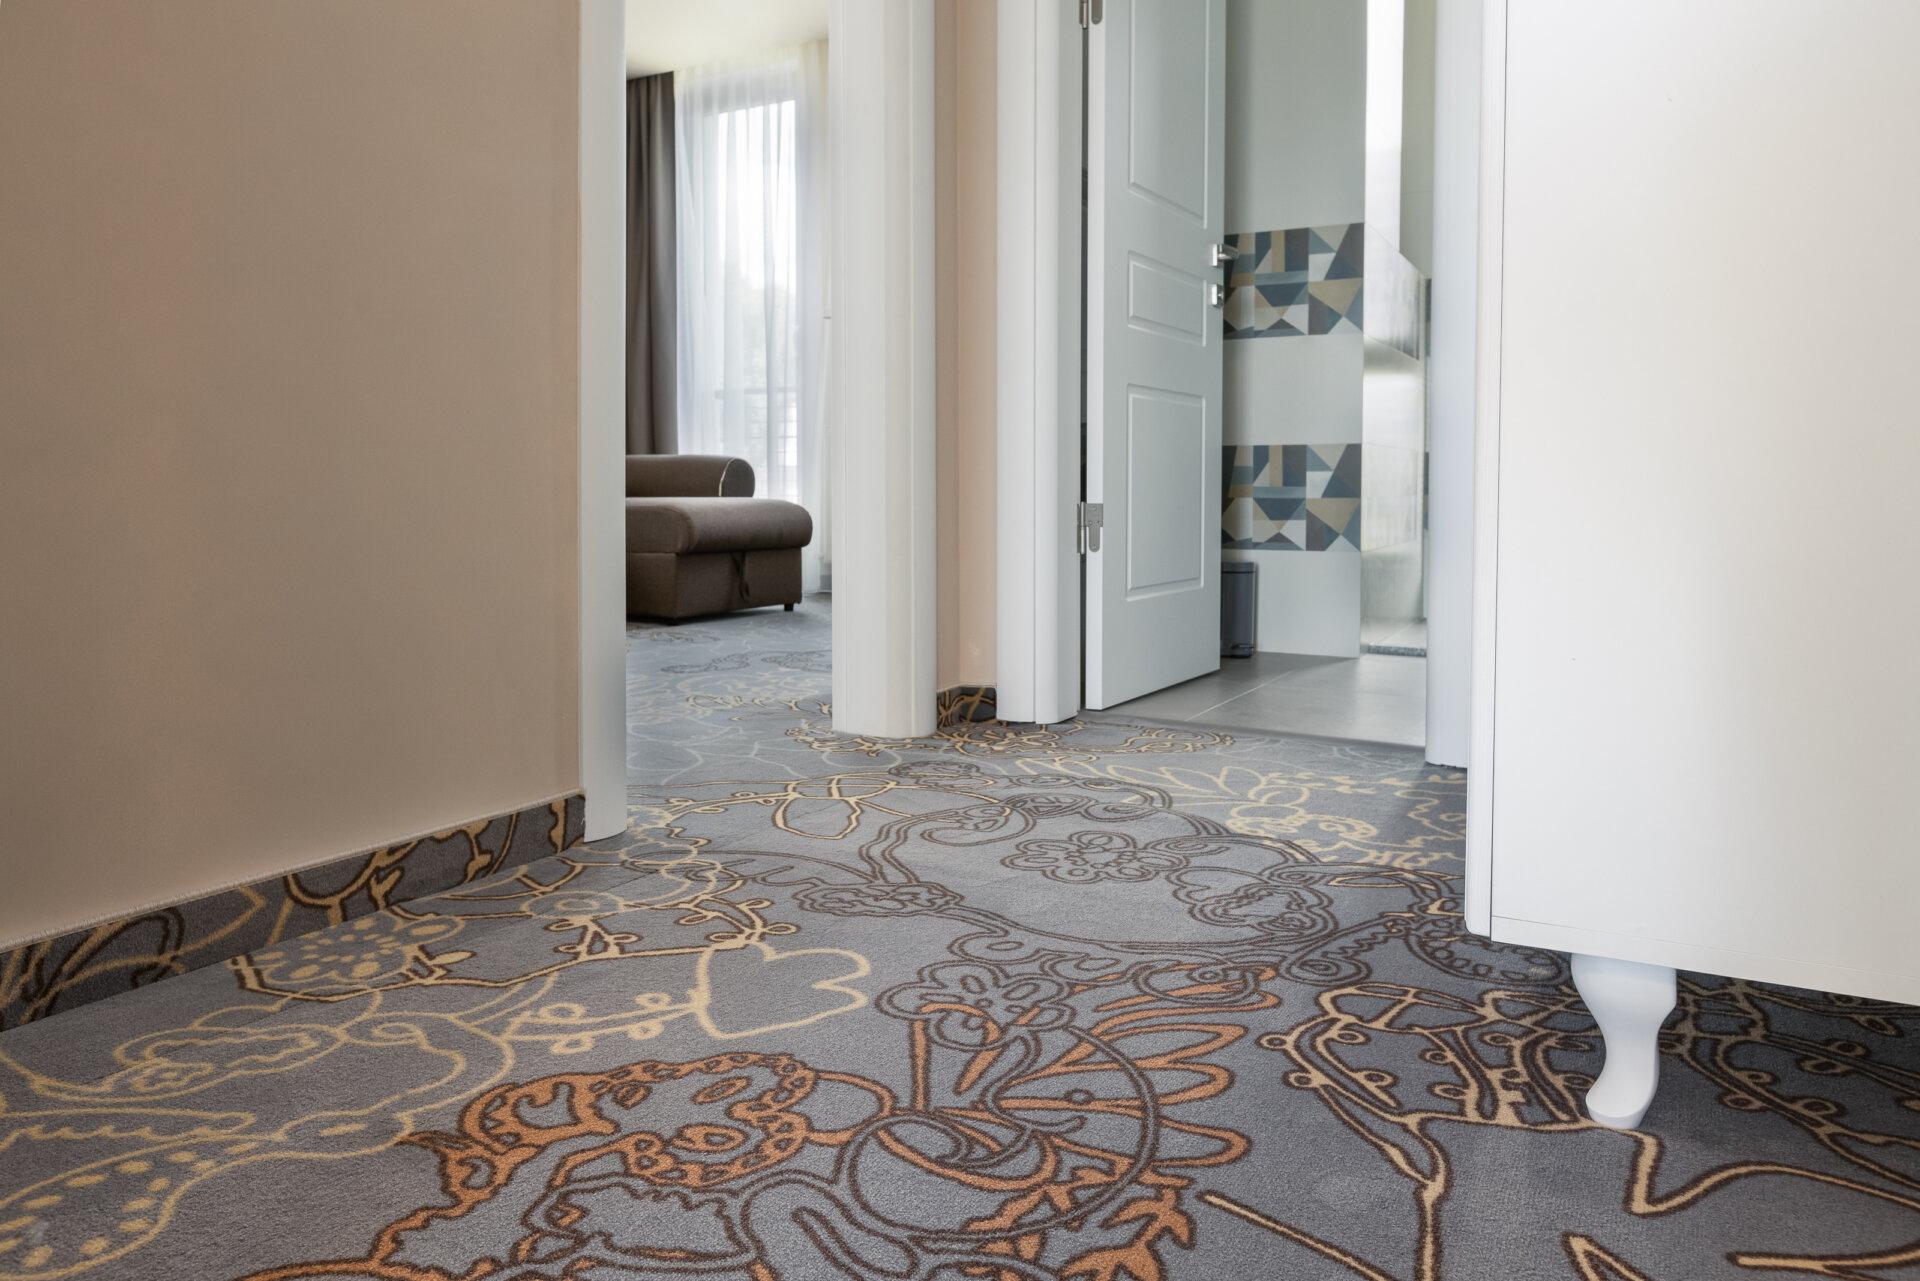 20210524-carpet&more-mamaia-hotel-scapino-junior-by-hugmedia-032